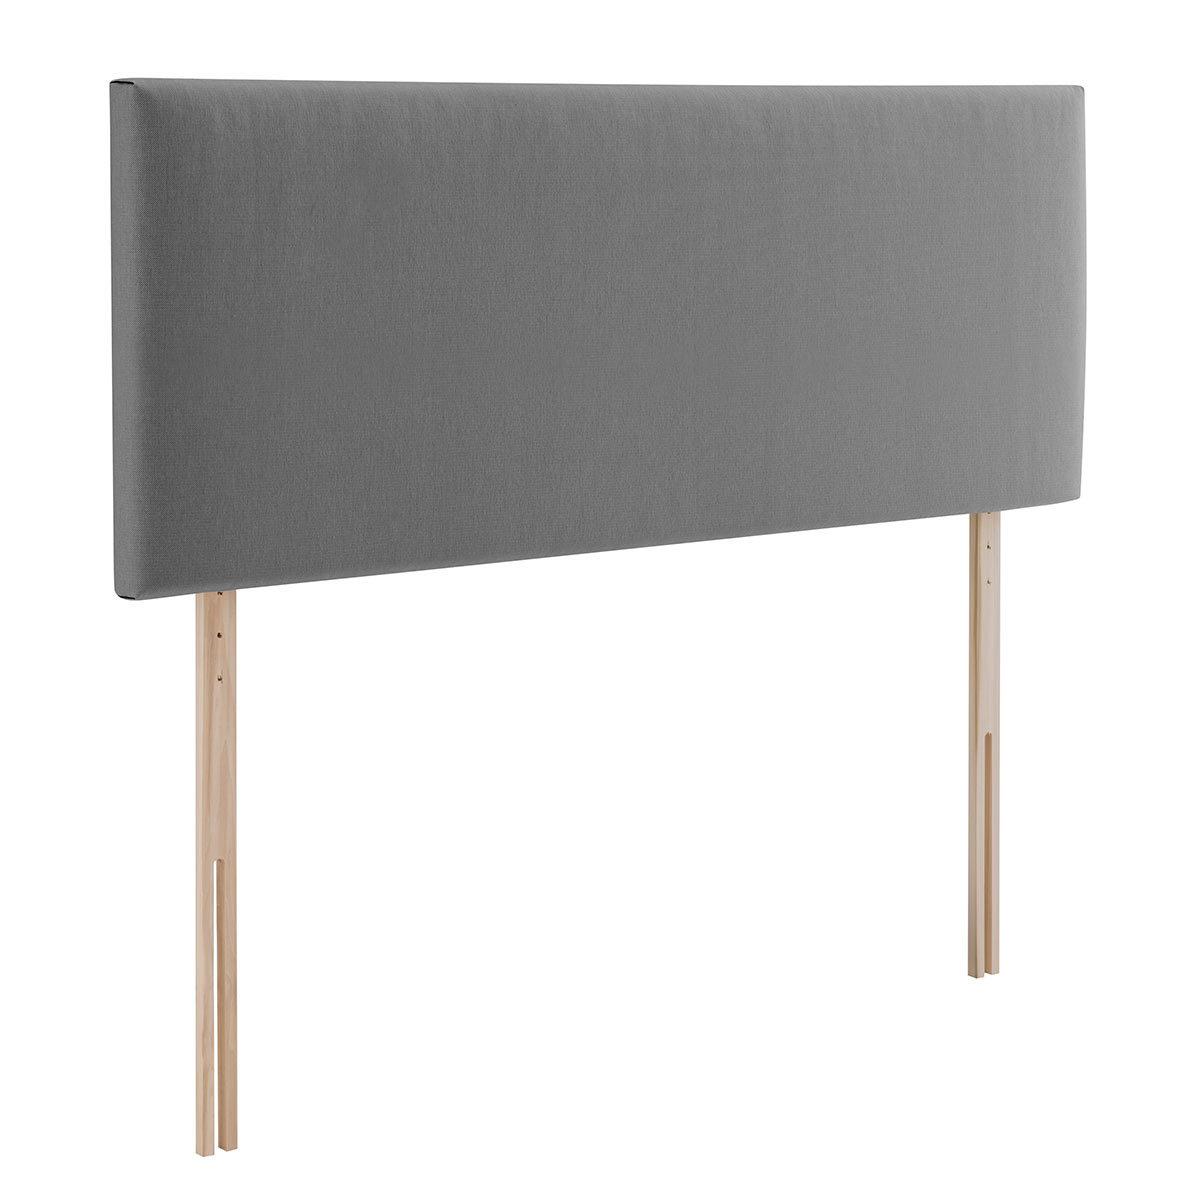 Silentnight Bexley Grey Fabric Headboard Double Costco Uk